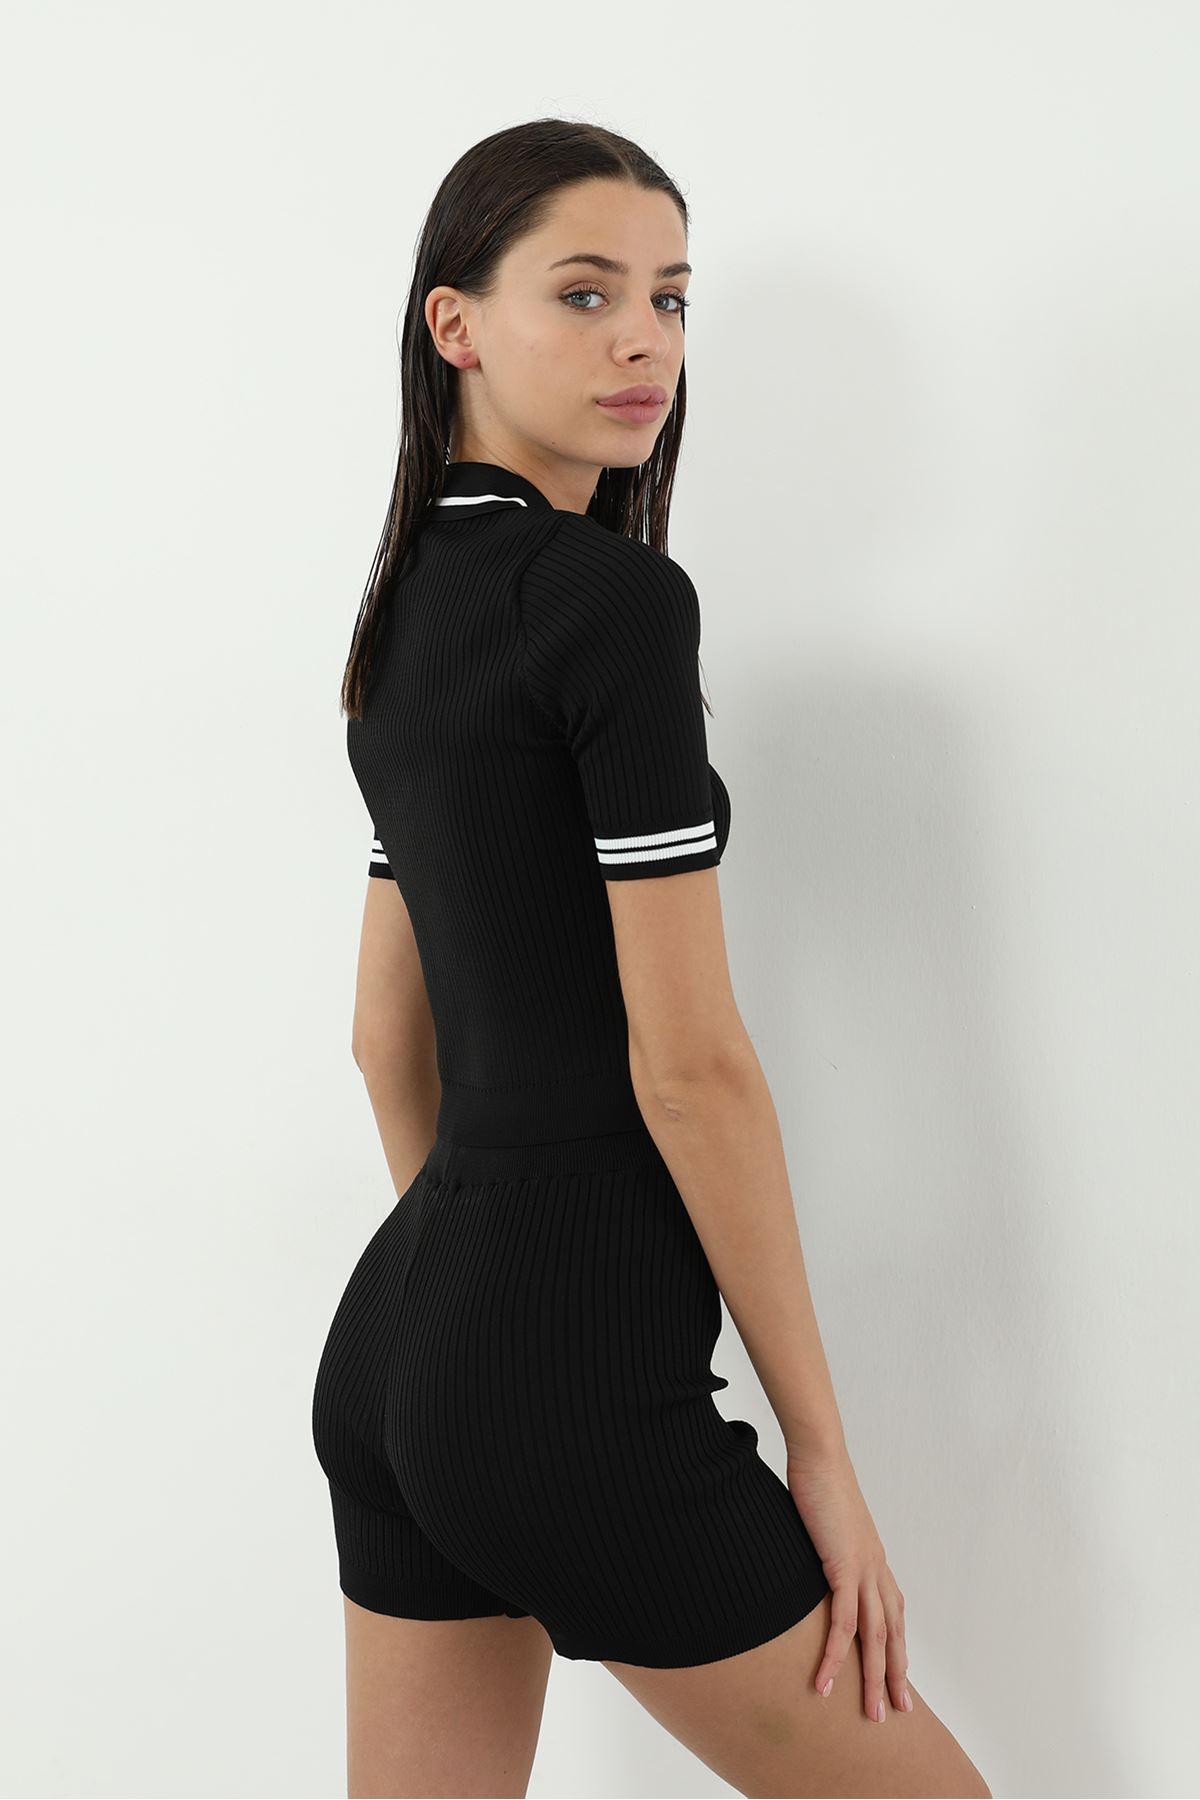 Polo Yaka Şortlu Takım-Siyah